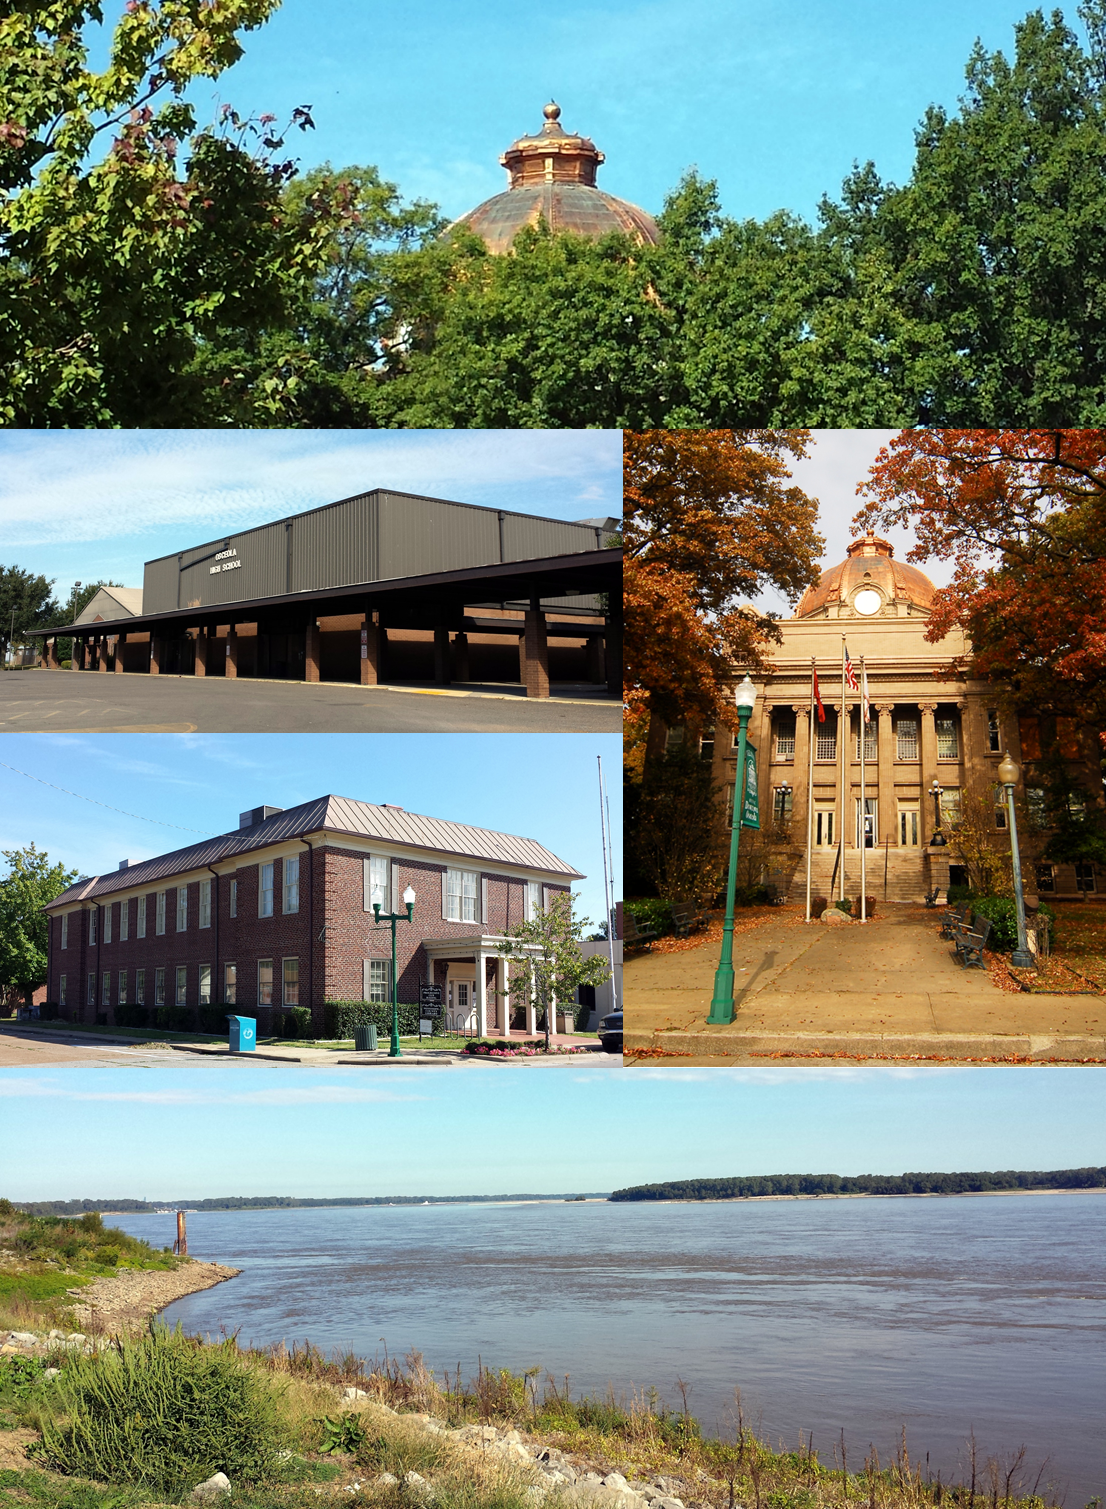 Accounting Manager Salary in Osceola, Arkansas